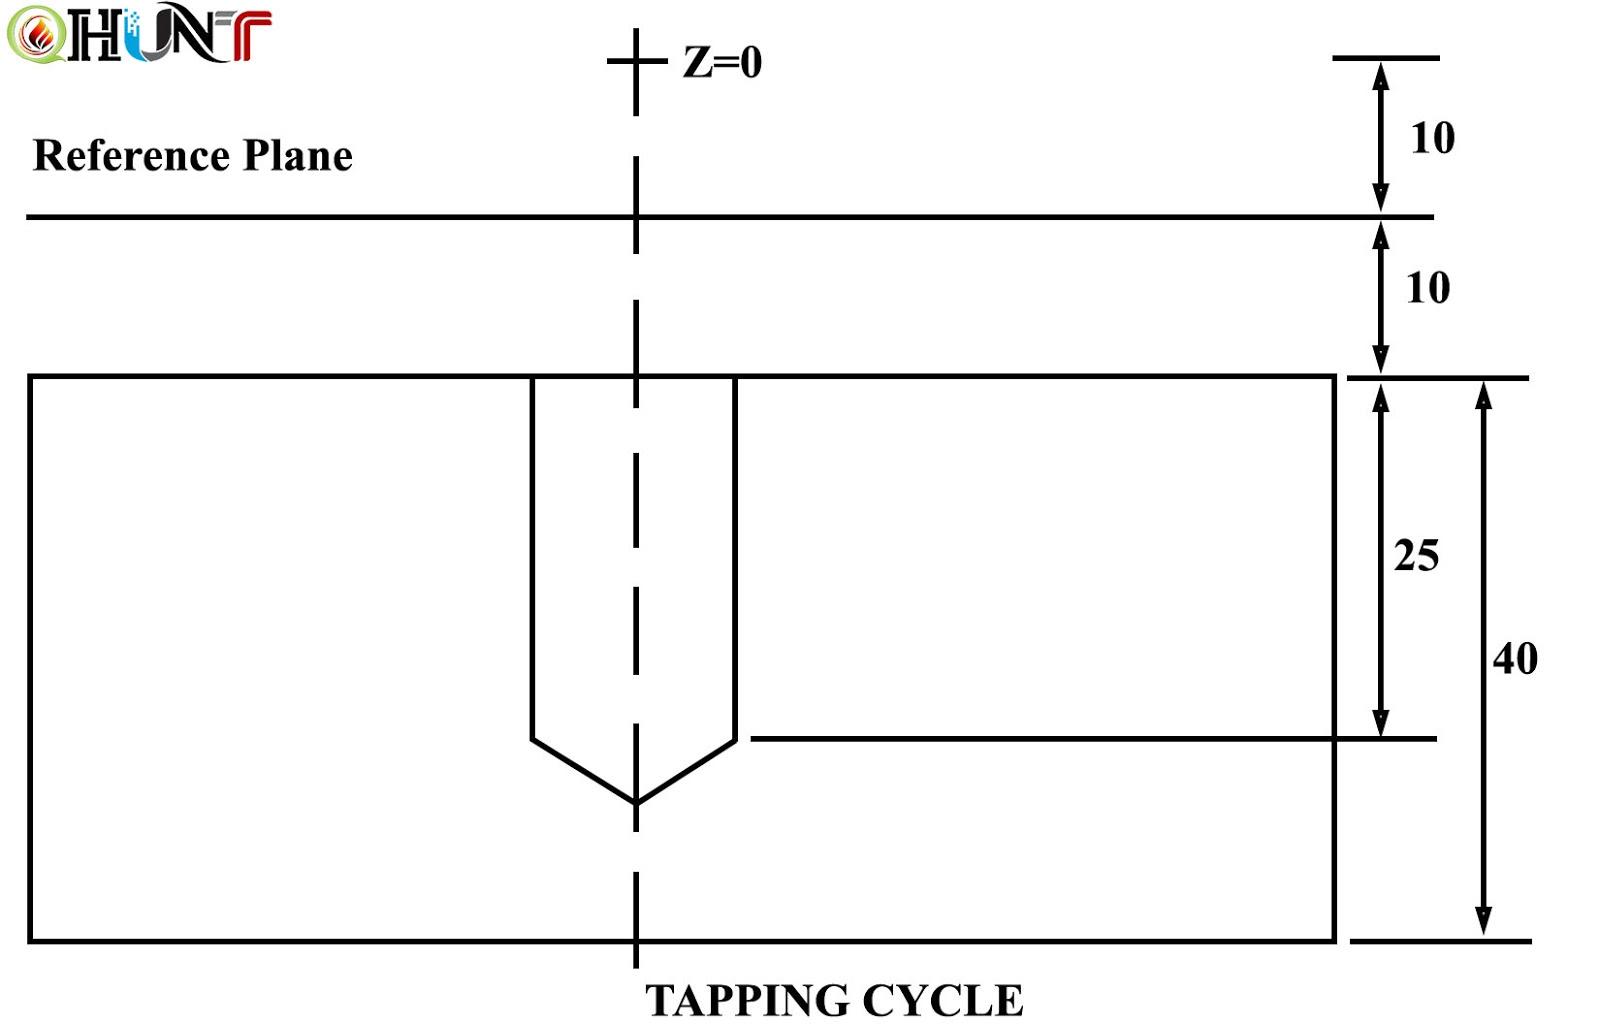 Cycles in CNC Milling Machine - Q Hunt